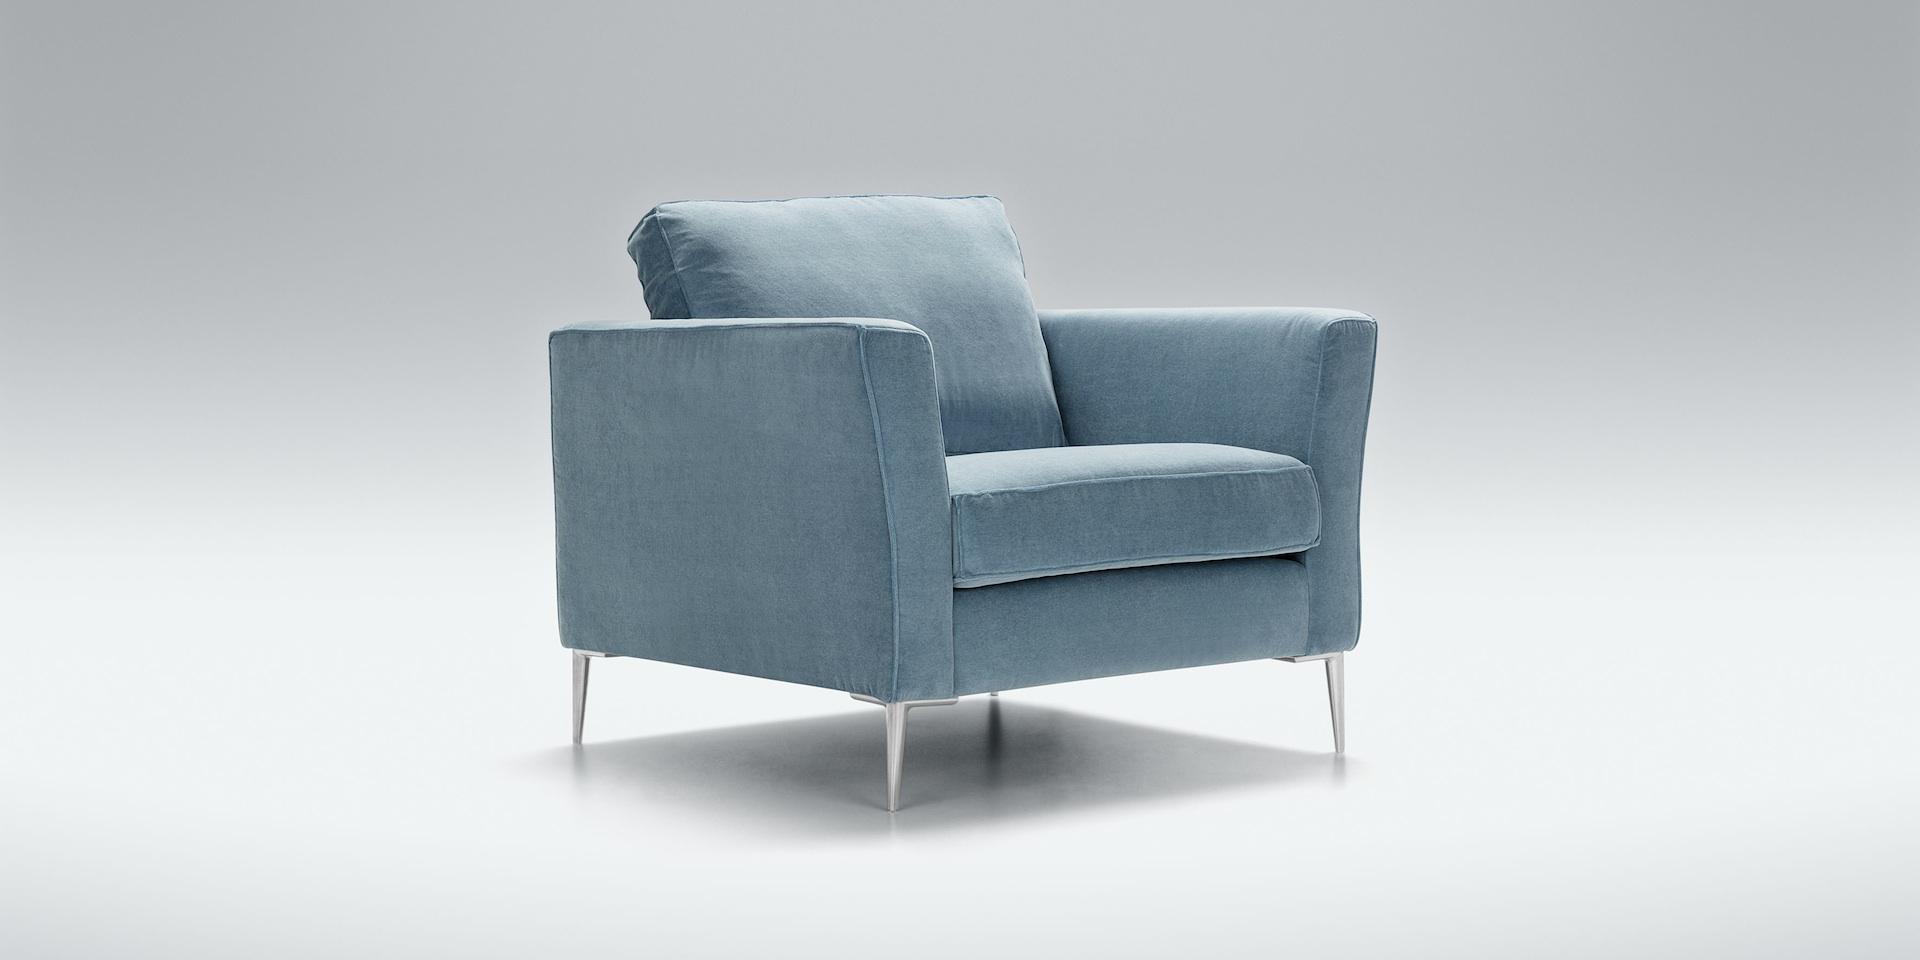 CAPRICE_shadow_armchair_malibu_velvet5_blue_2